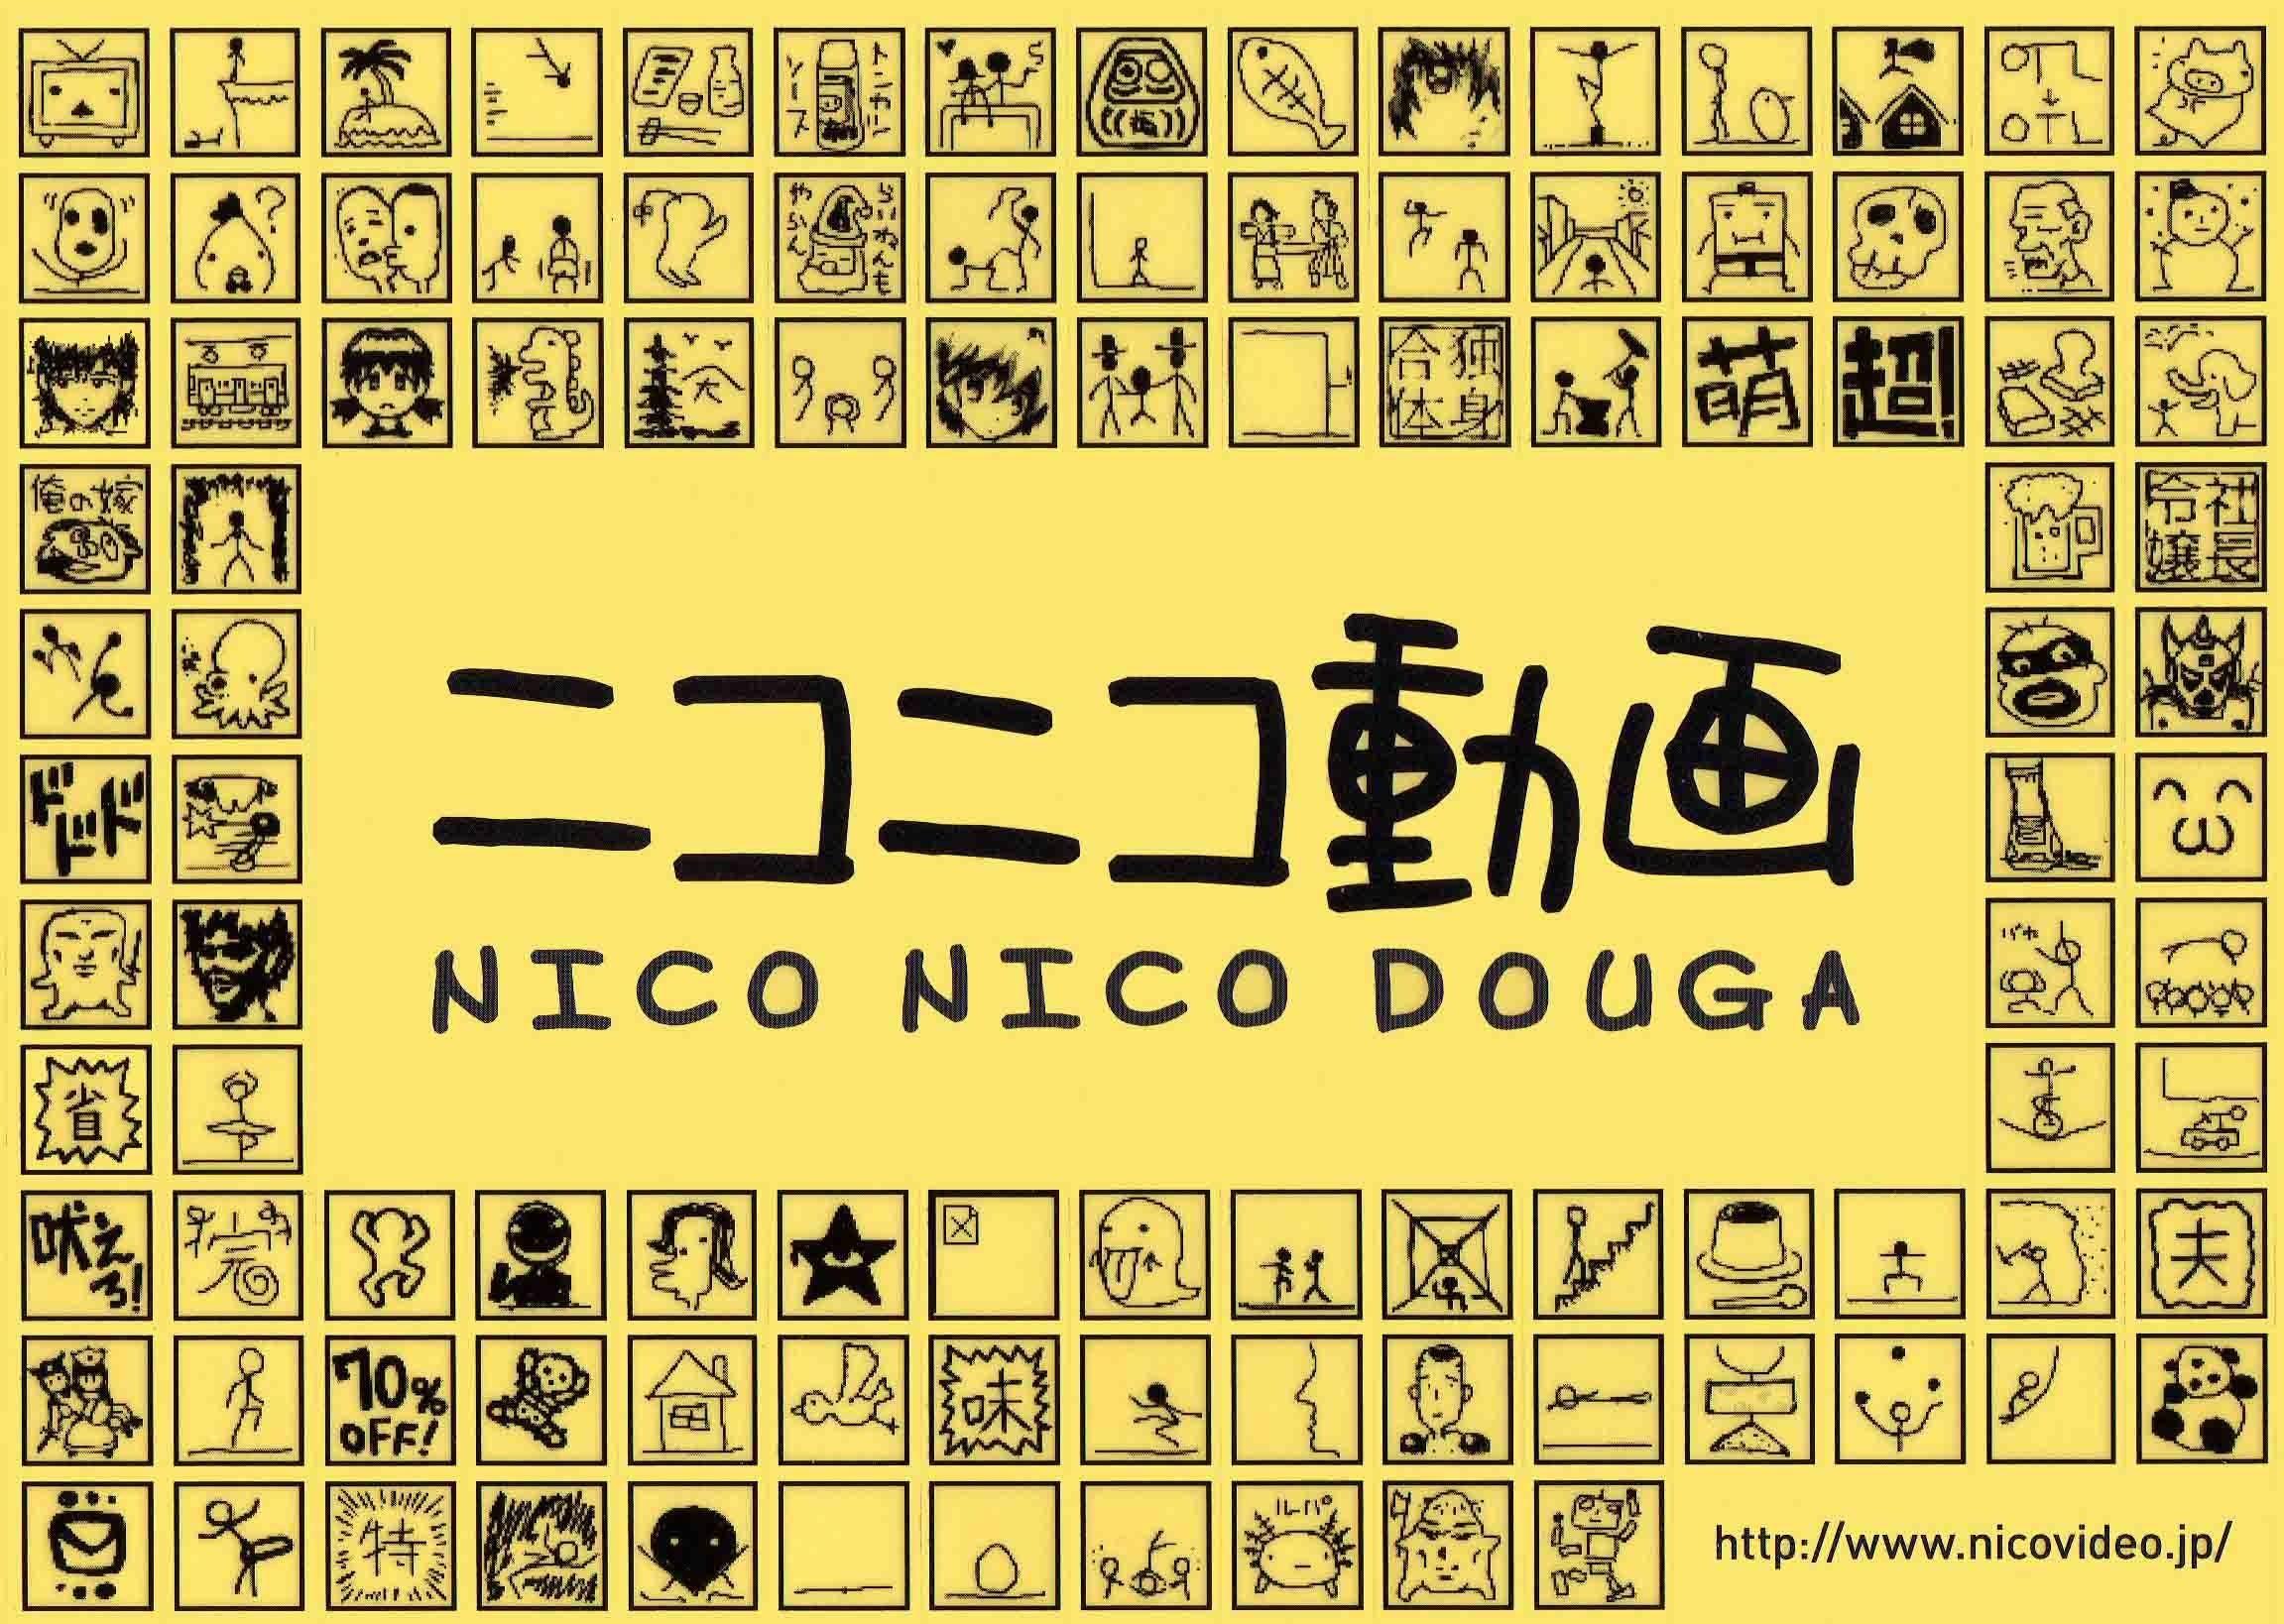 Niconico用戶選出了他們認為2017最有趣的20個動畫